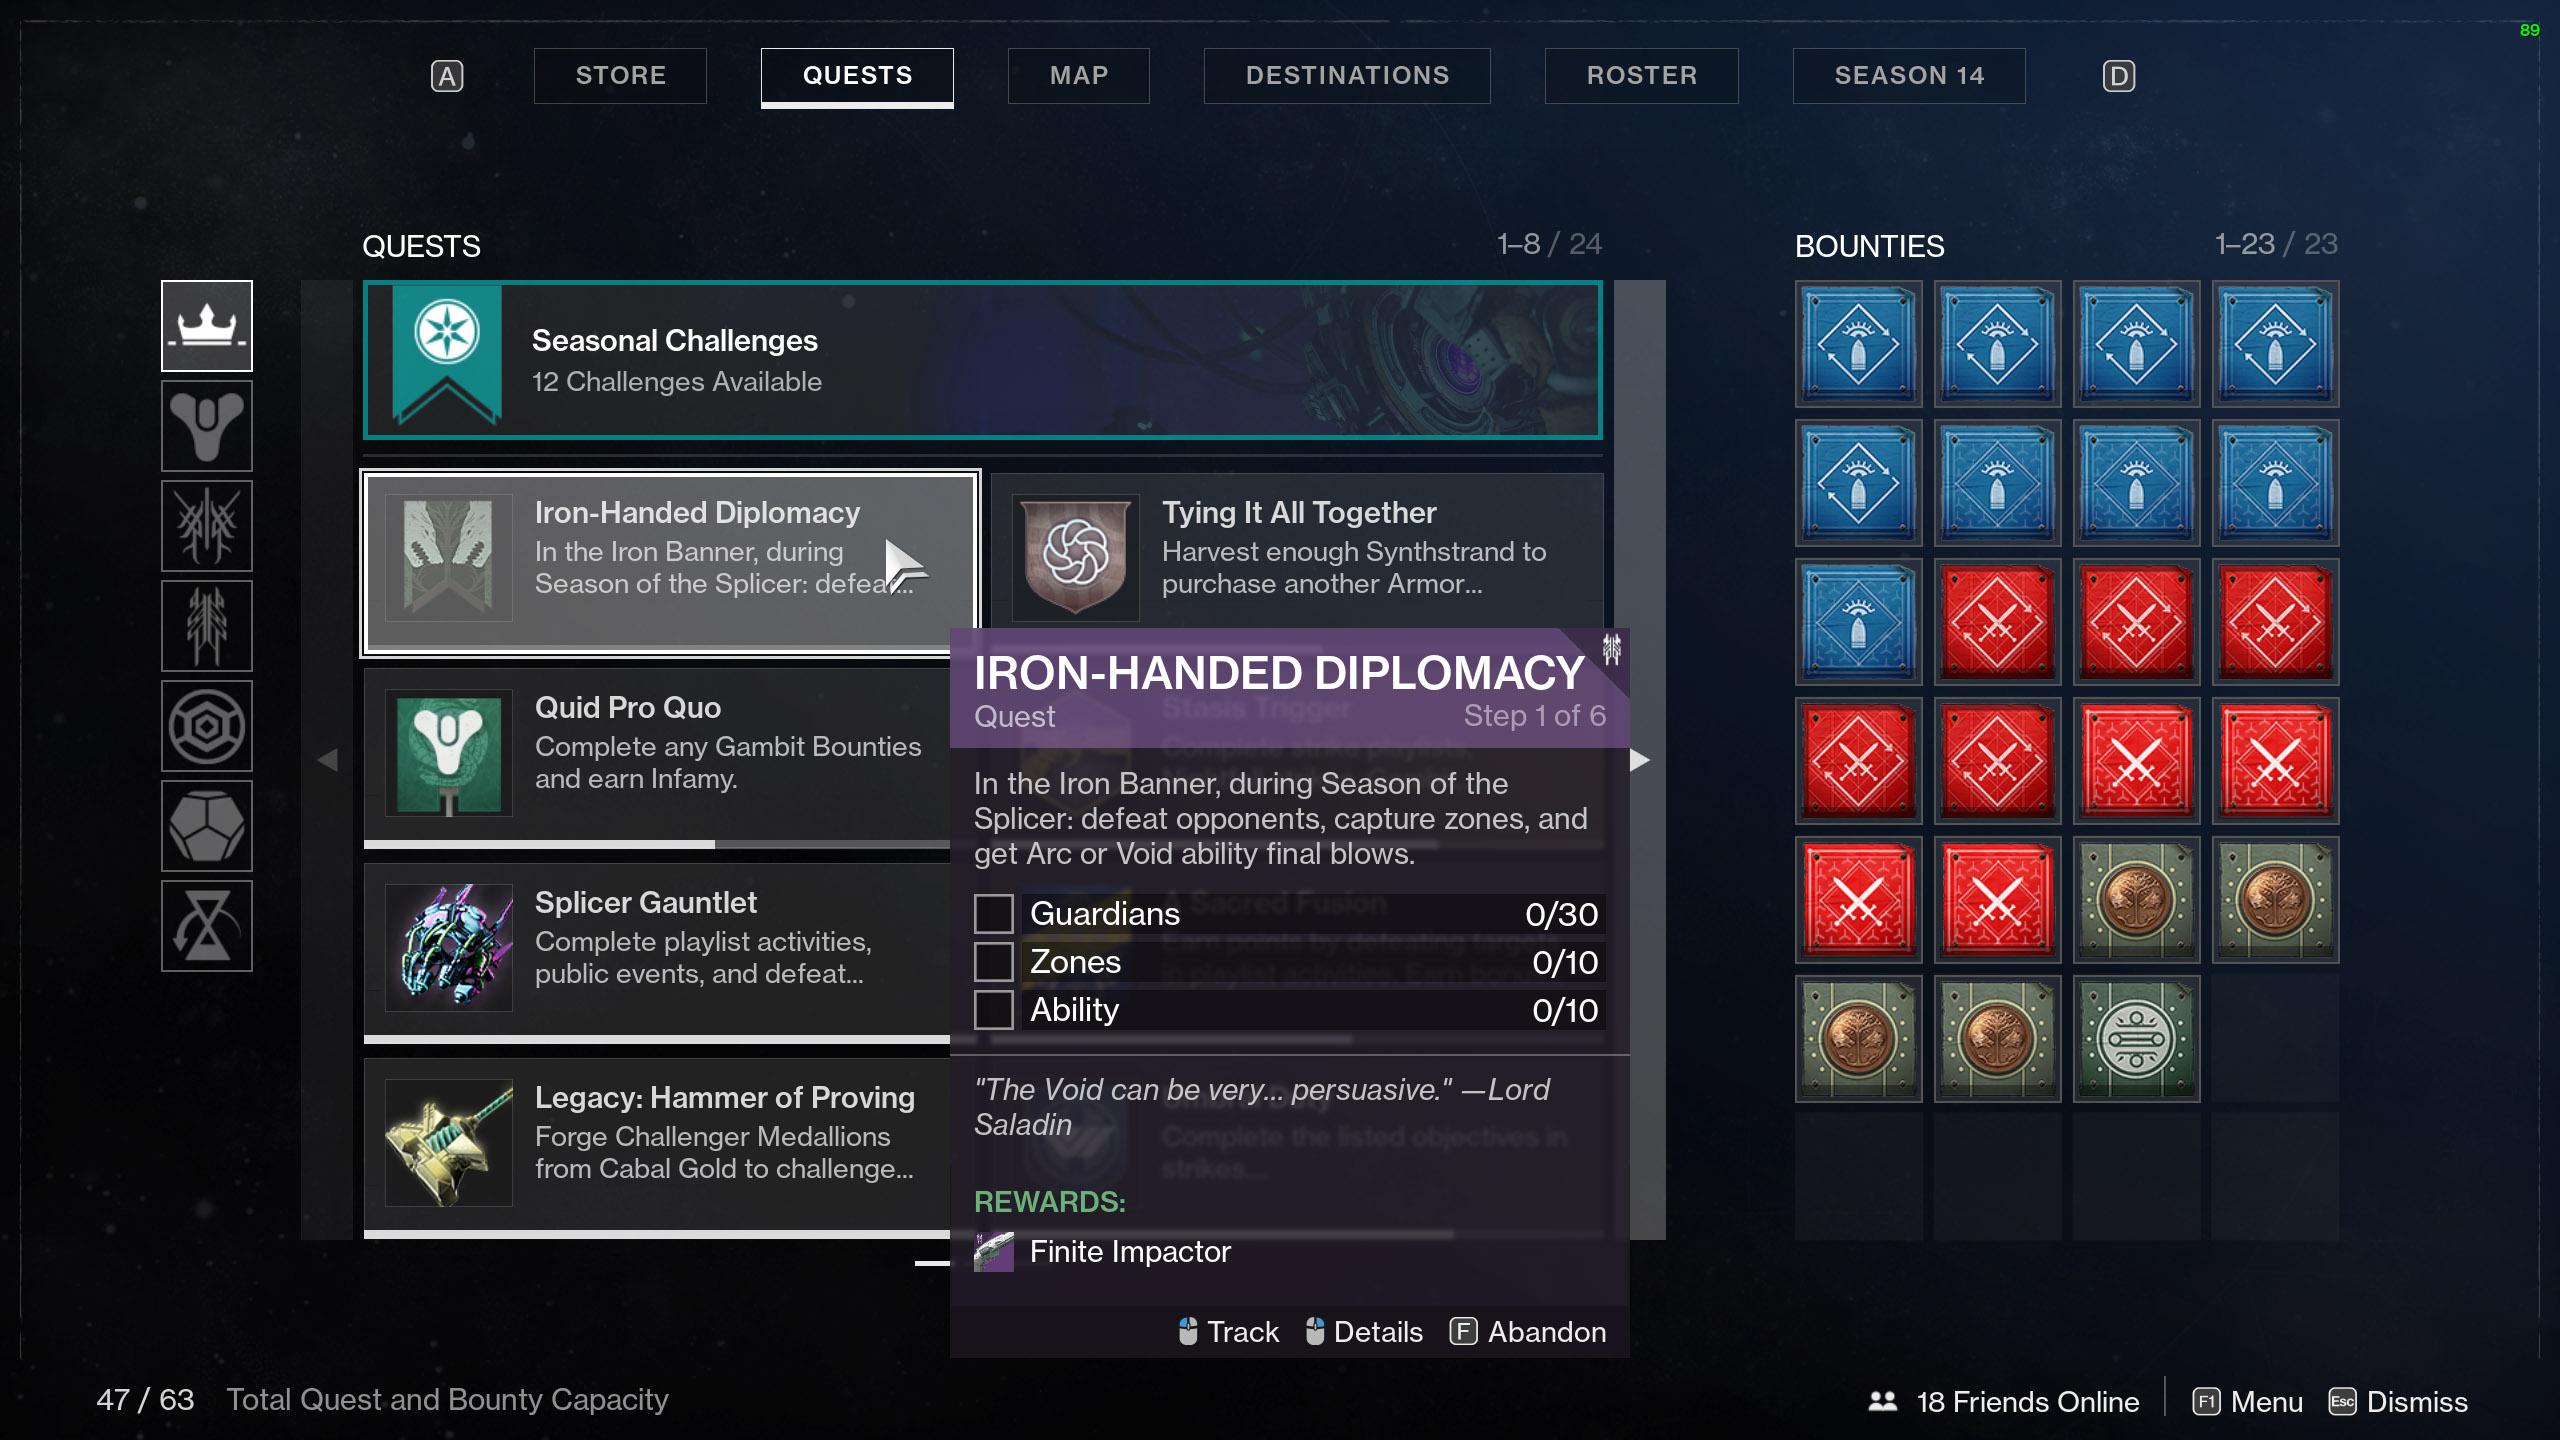 destiny 2 iron banner season 14 quest iron-handed diplomacy